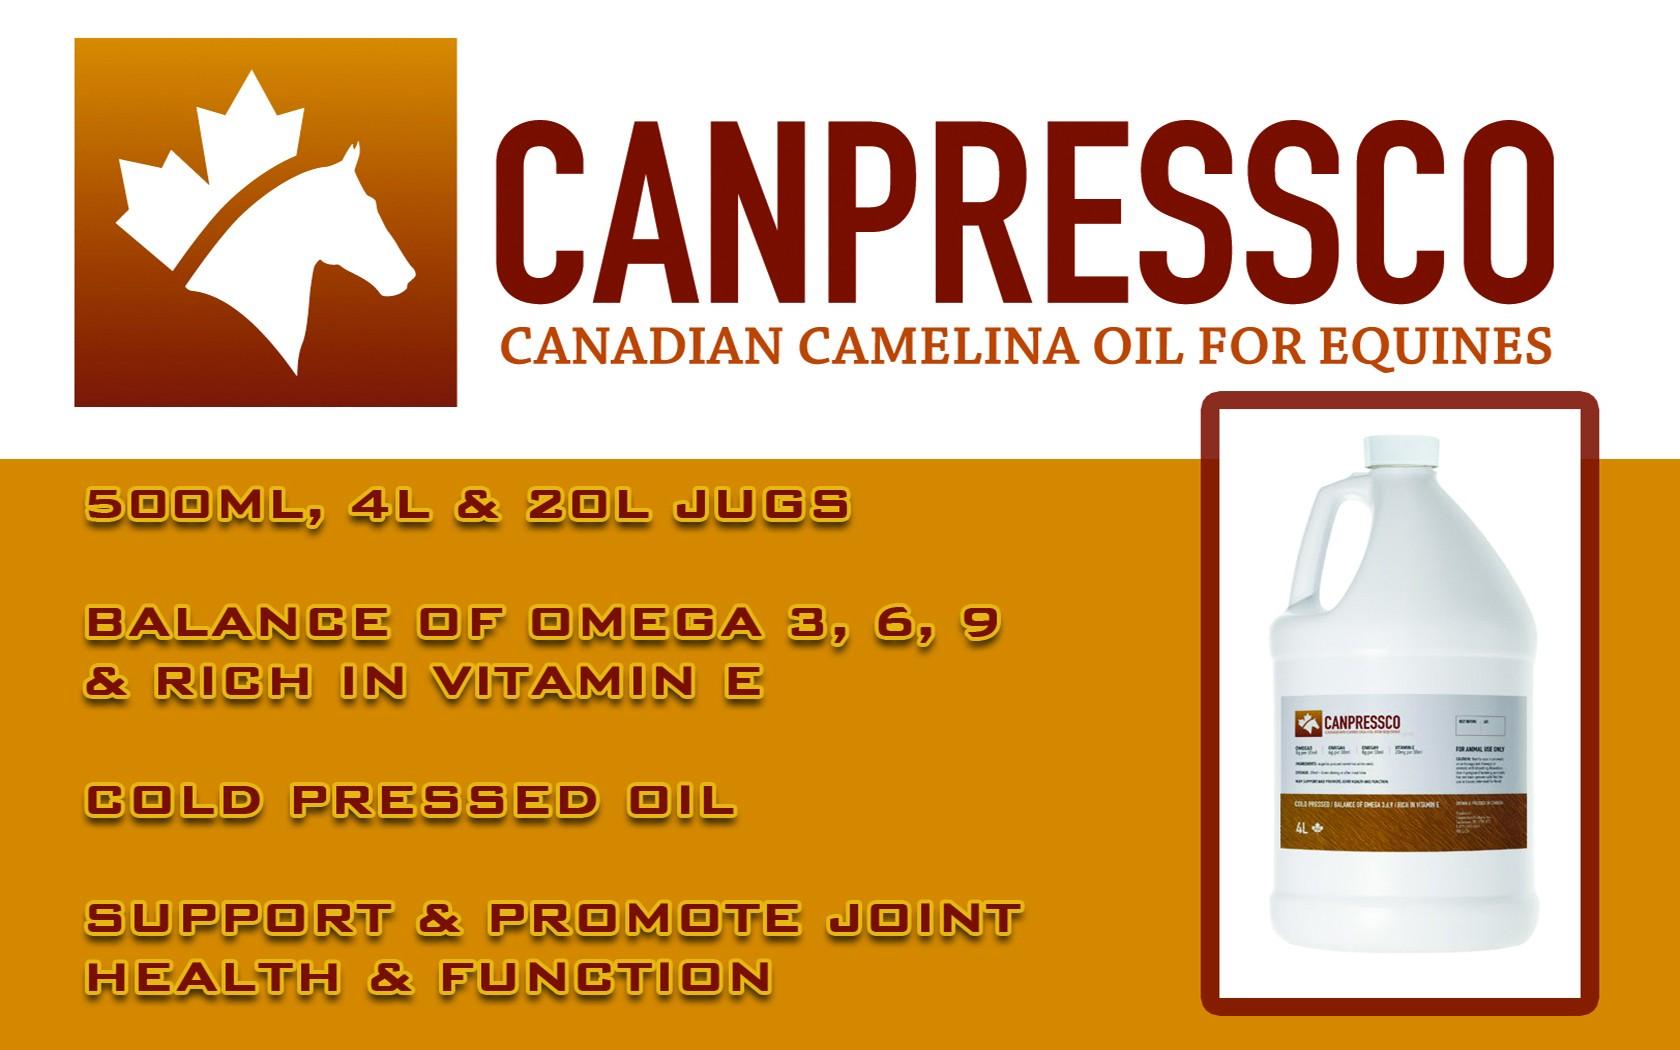 Canpresso